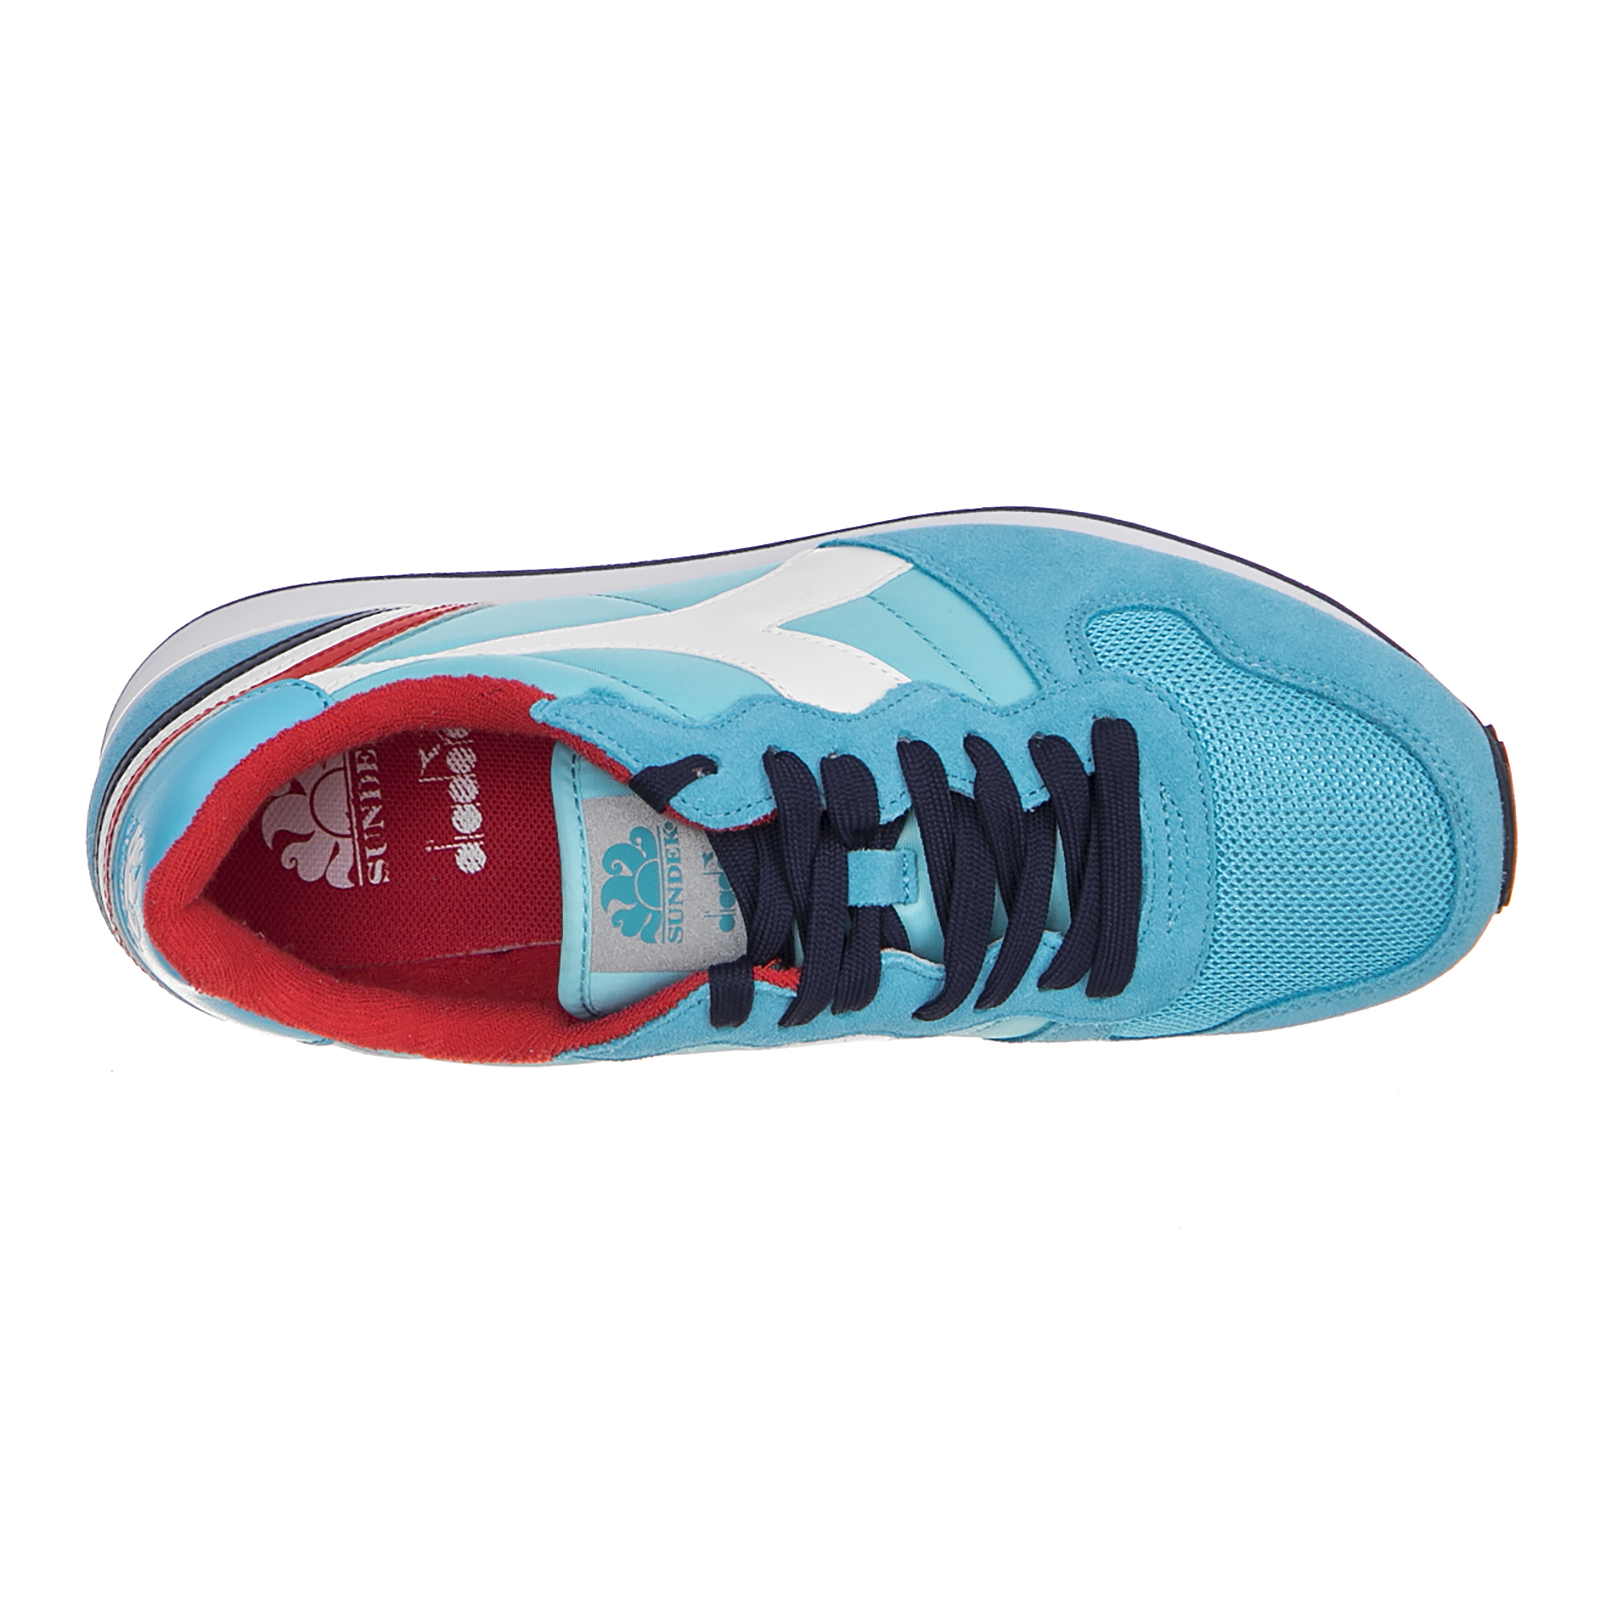 Diadora Turnschuhe Bademodenmarke Camaro Bademodenmarke Turnschuhe Atoll Blau Blau 93e124